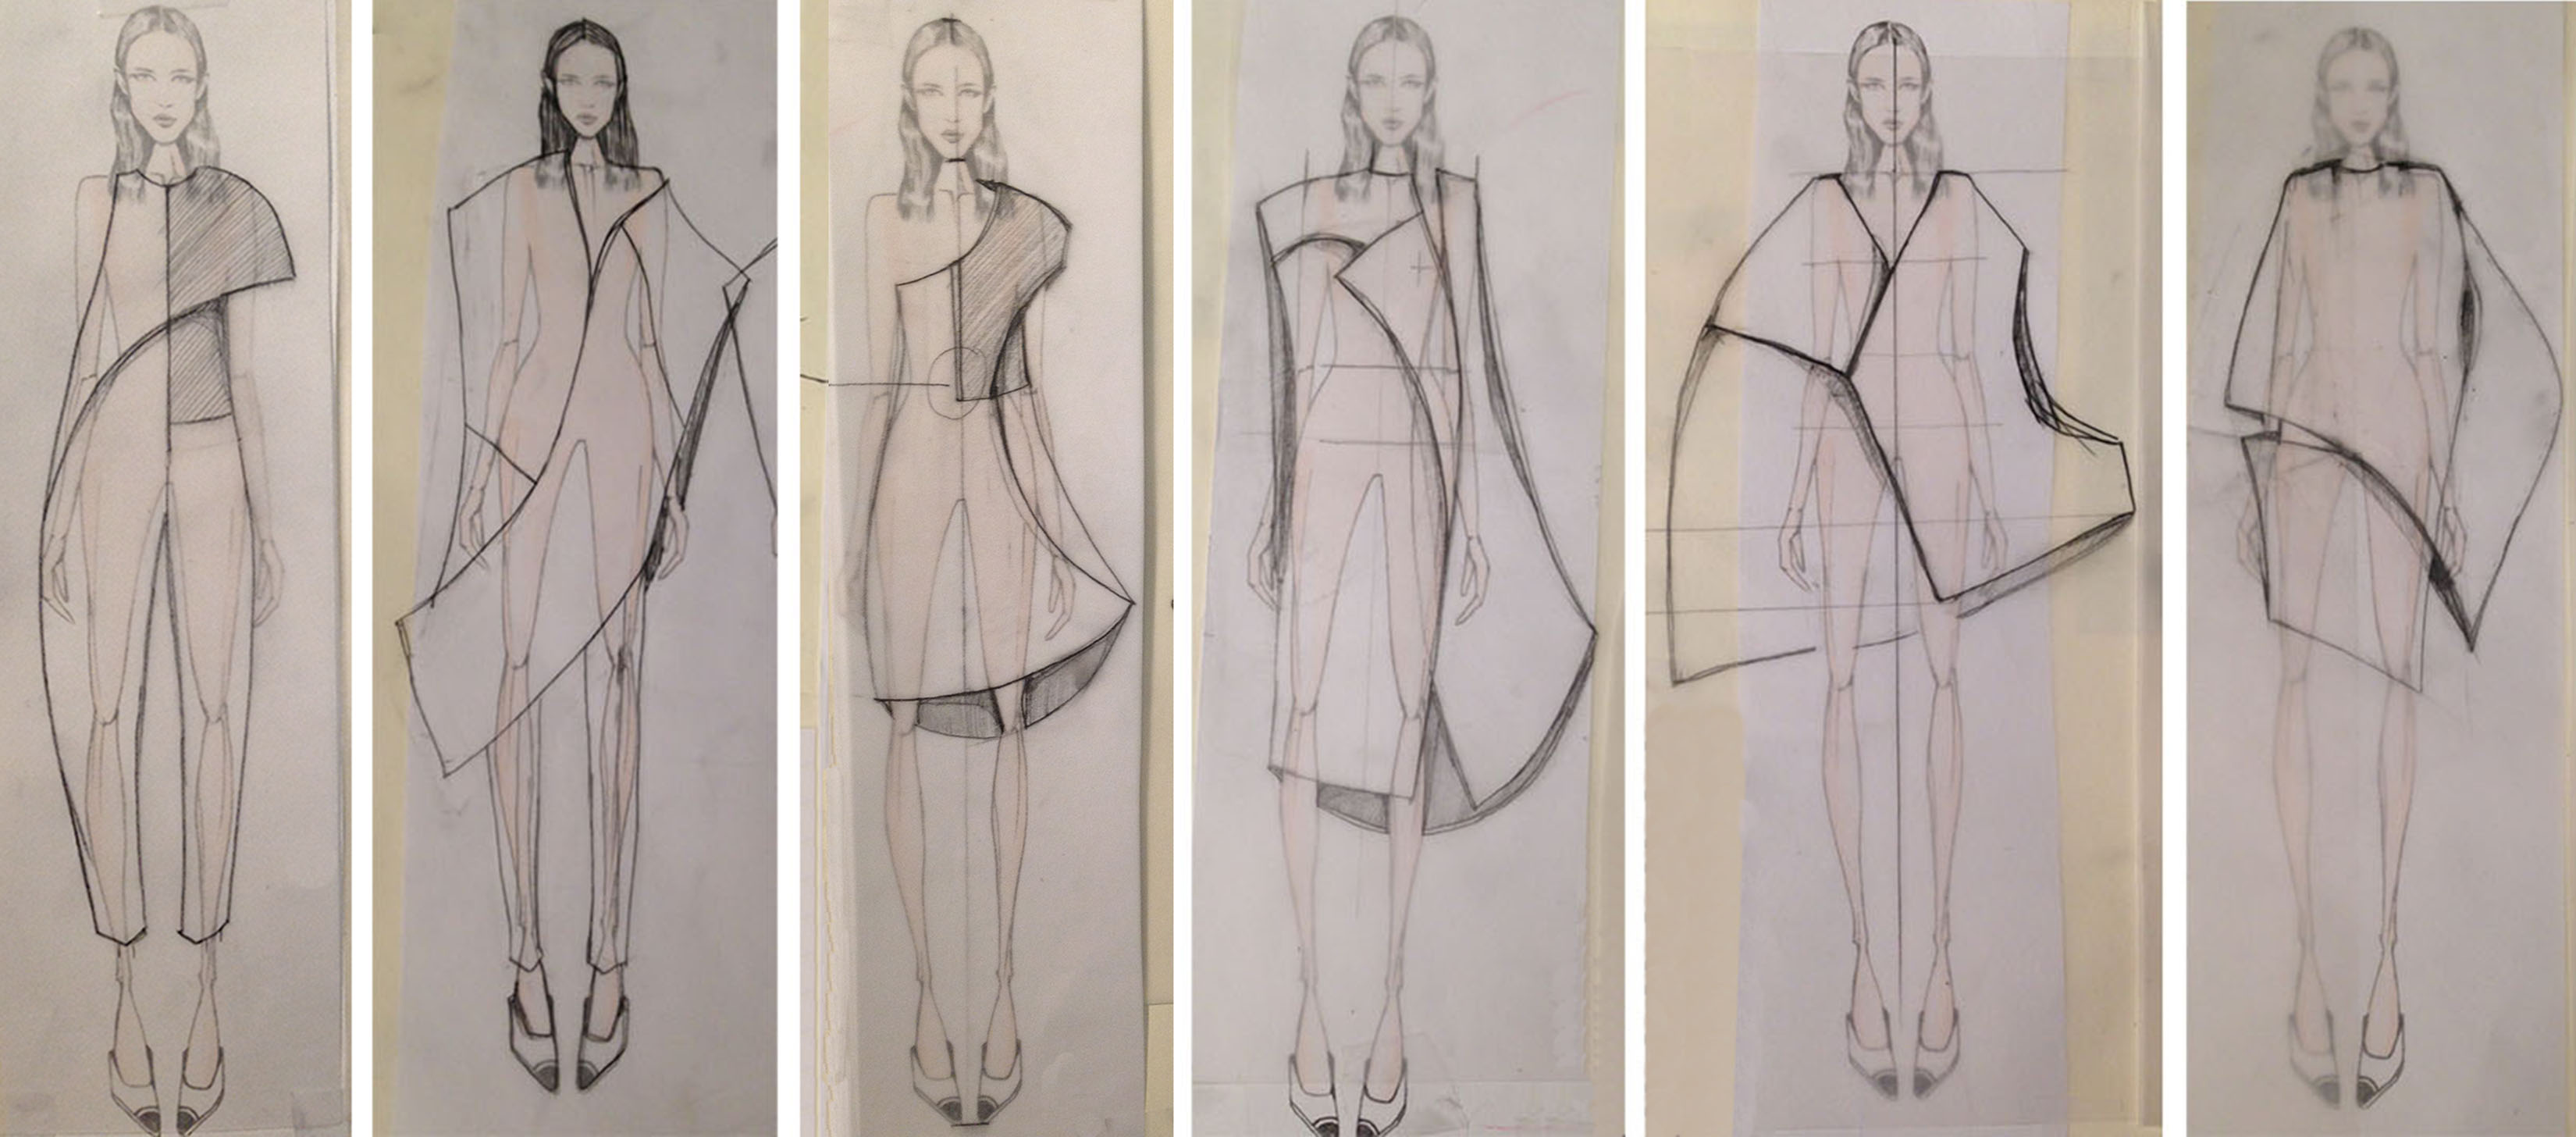 Academy Of Art University Fashion School Daily School